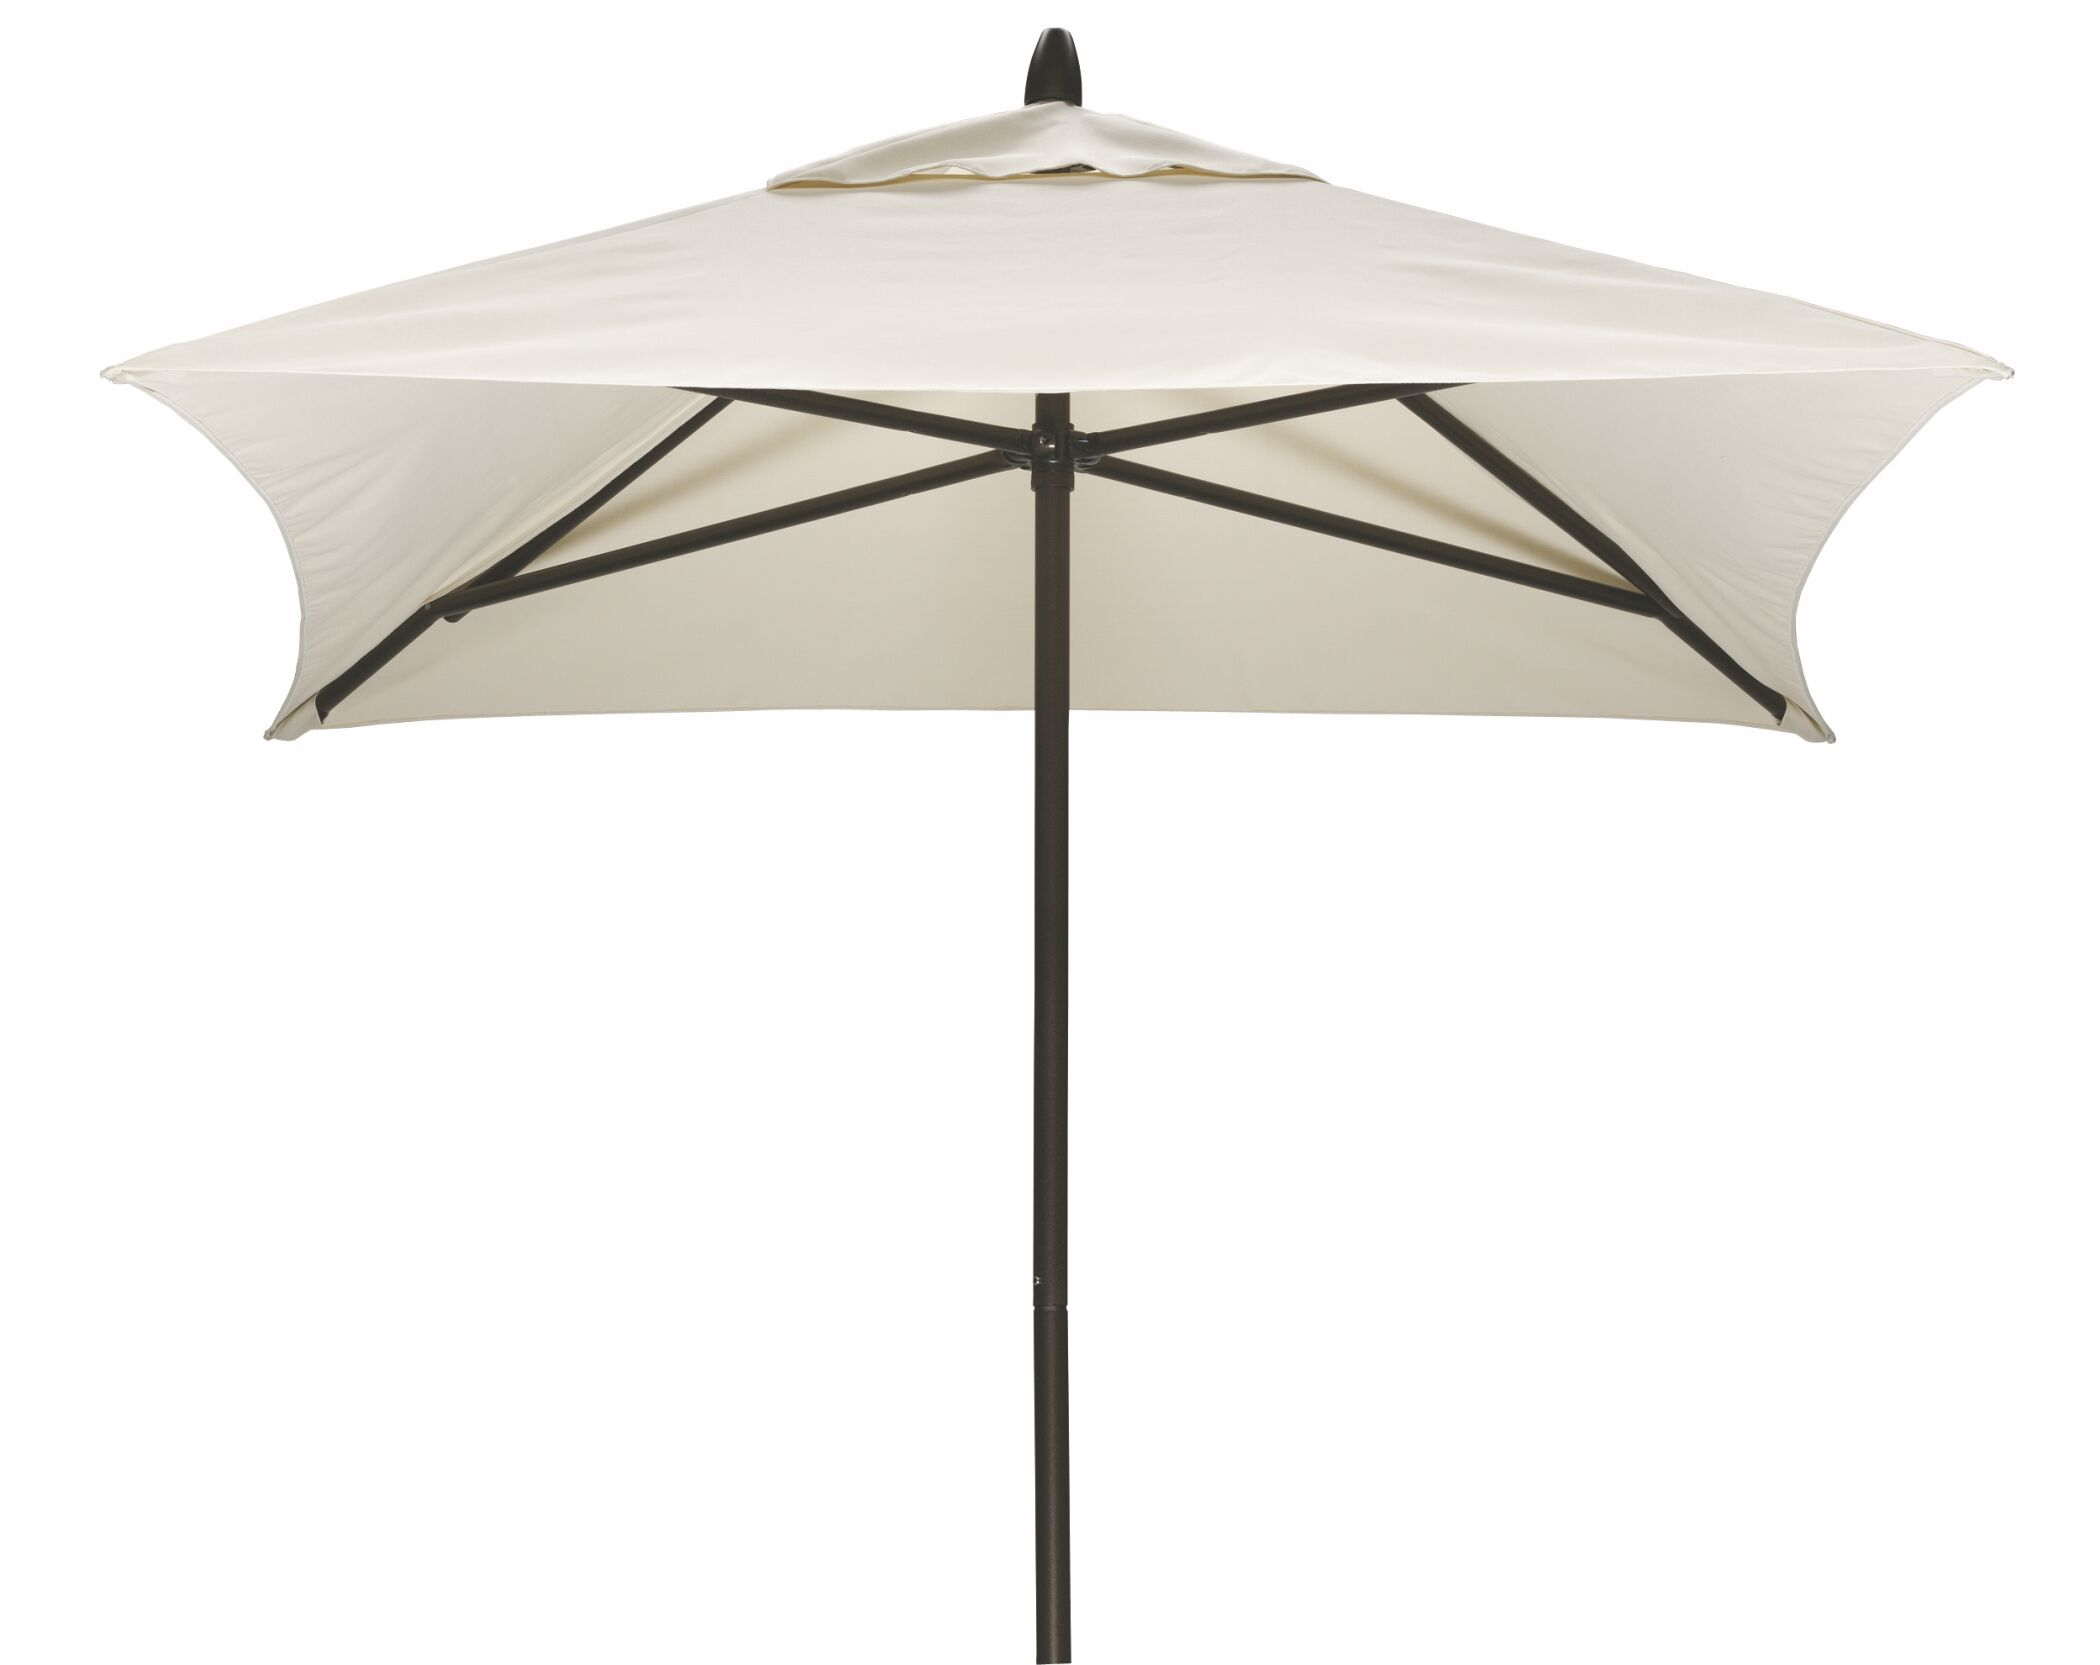 Commercial 6' Square Market Umbrella Frame Finish: Textured Aged Bronze, Fabric: Harvest